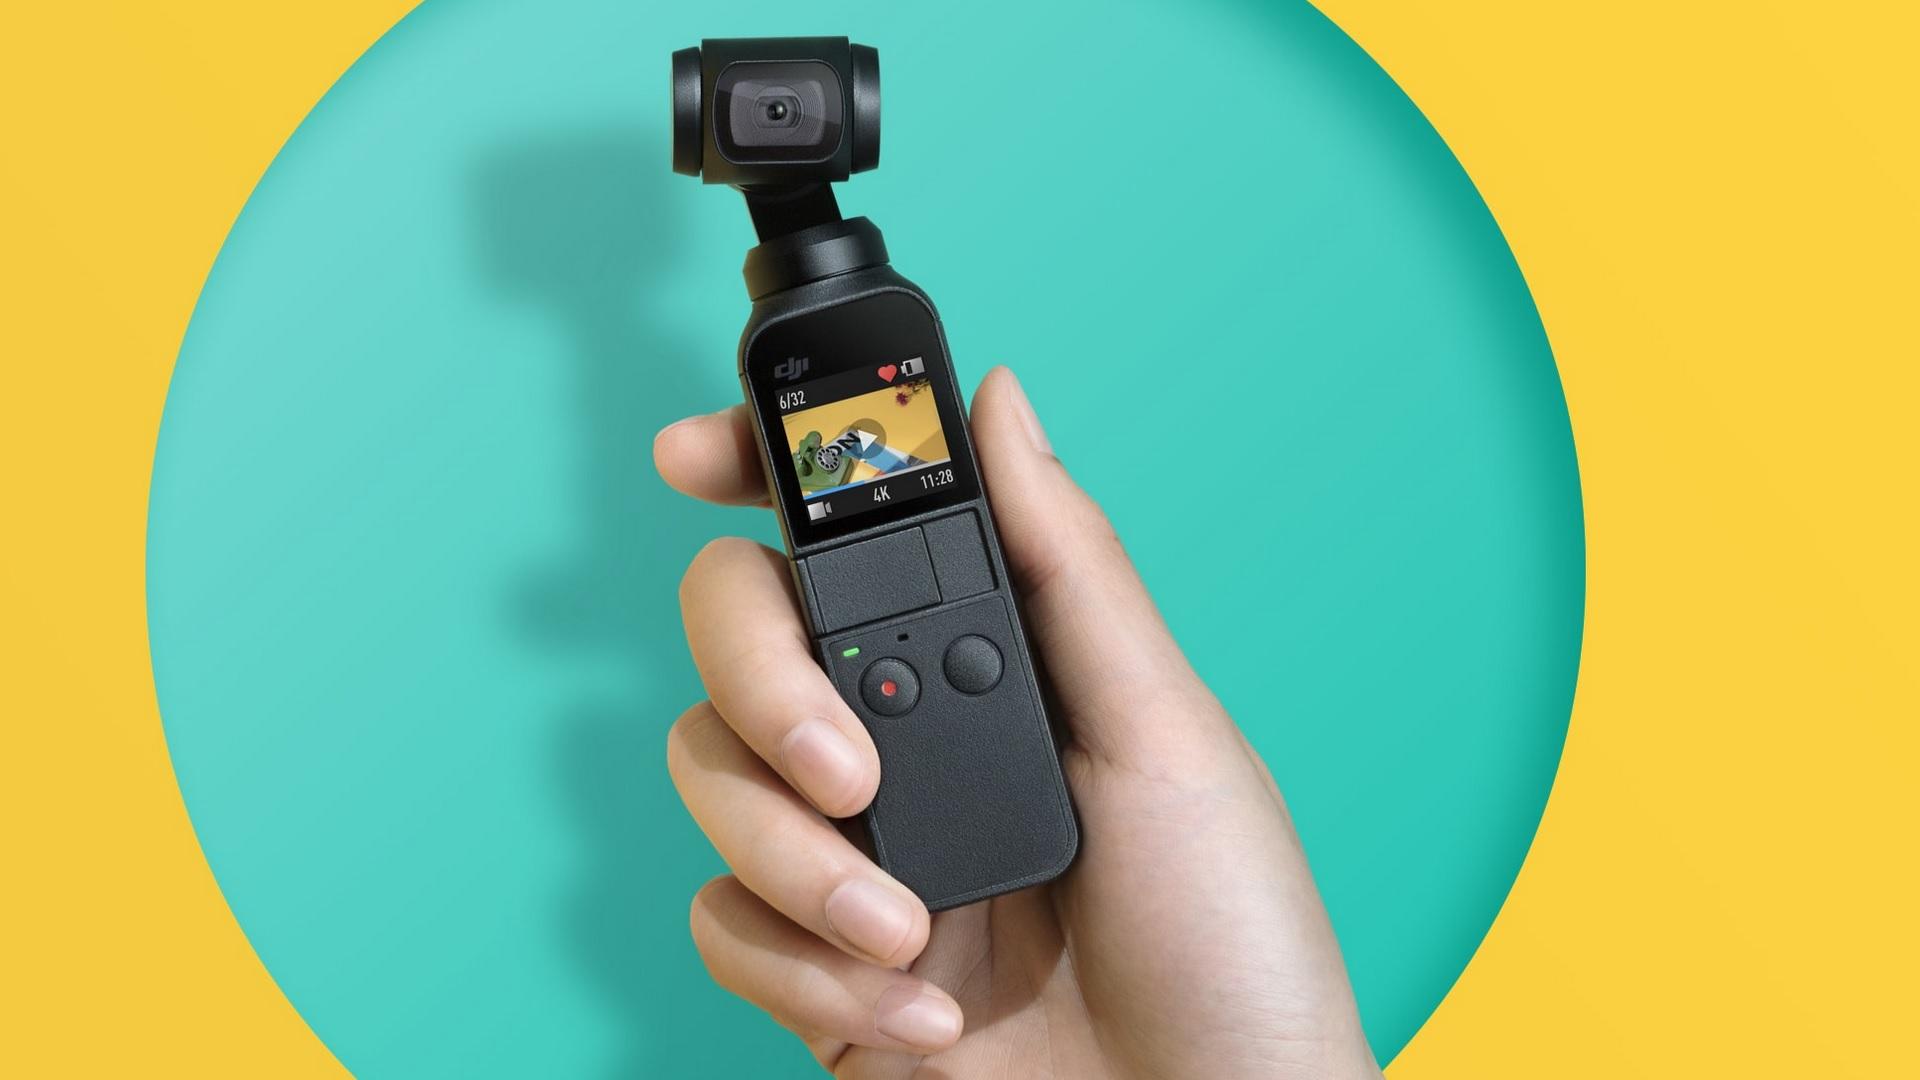 DJI Osmo Pocket - Tiny 3-Axis Stabilized Camera with 4K 60fps